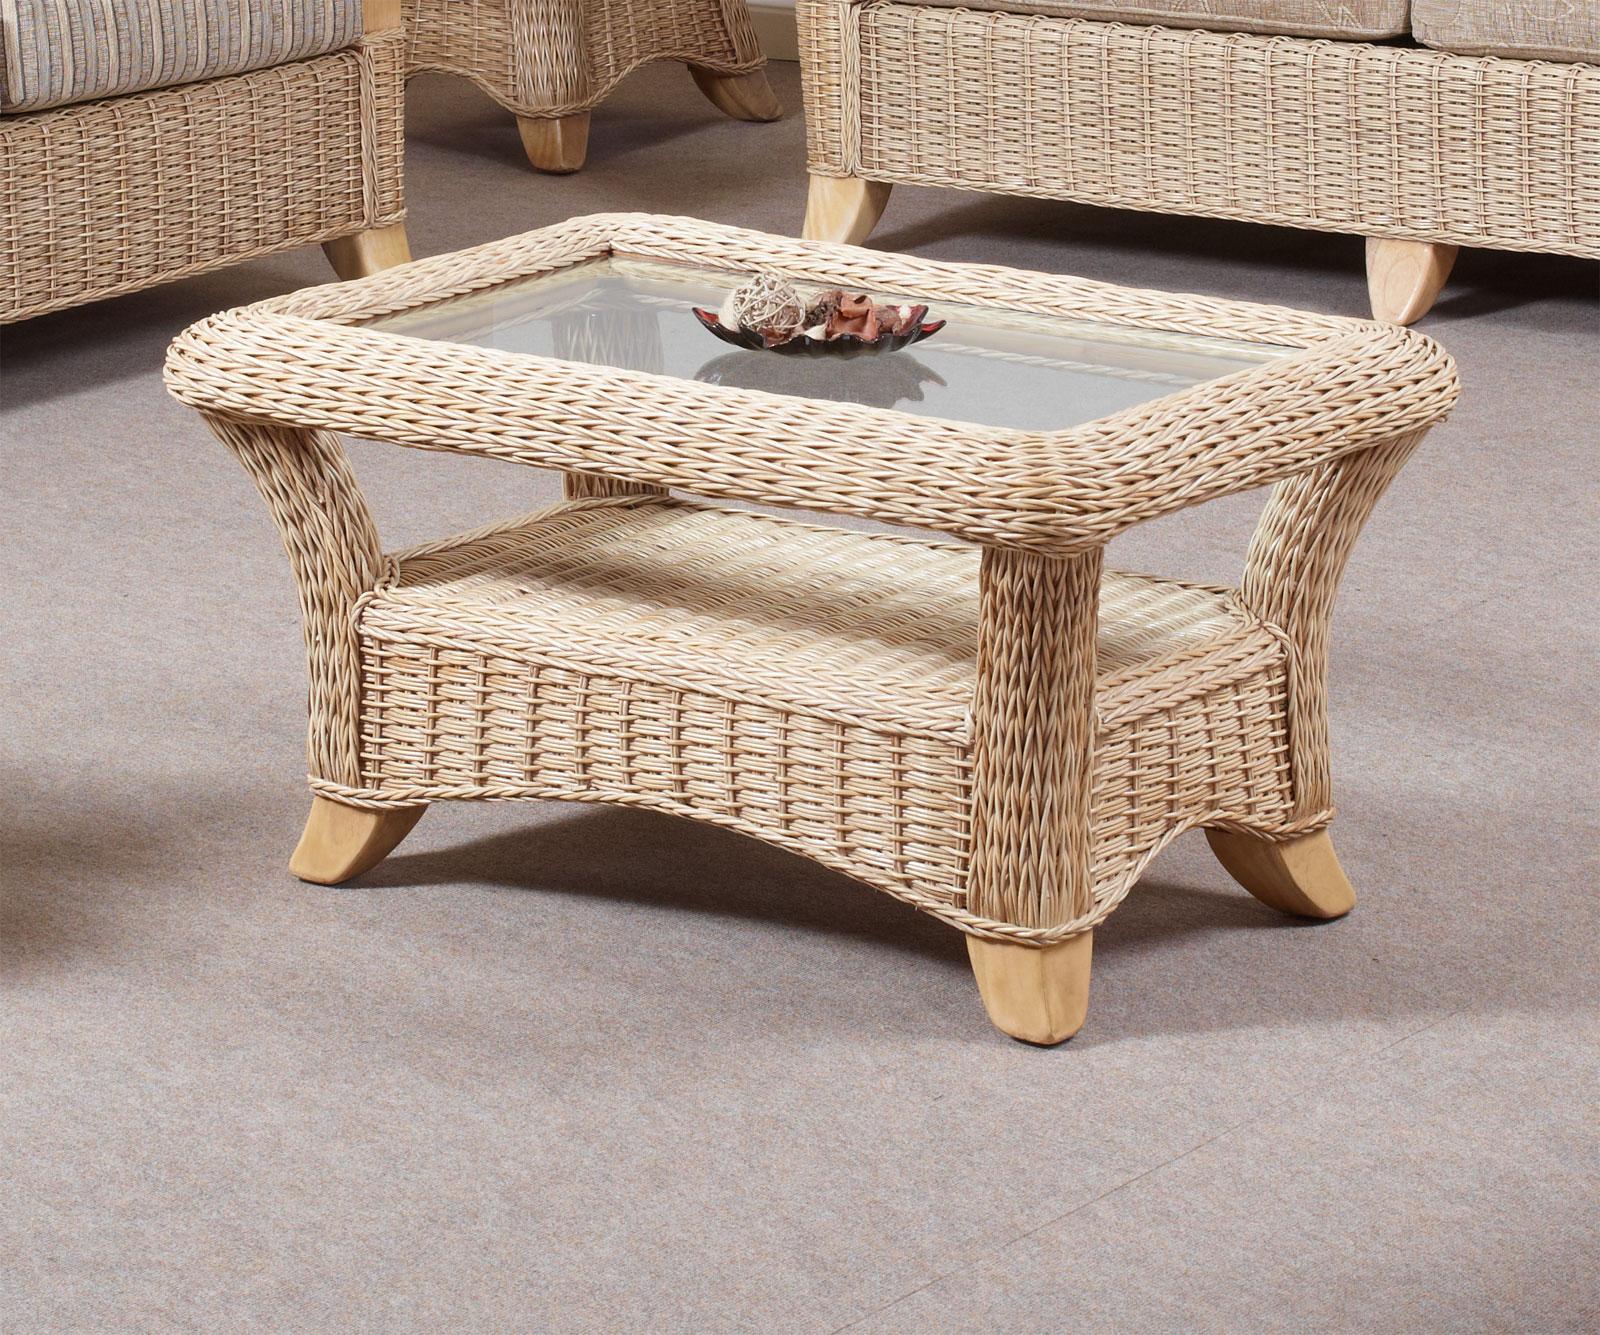 Hilton Conservatory Cane Furniture Wicker Coffee Table 91cm X 61cm X 48cm Ebay